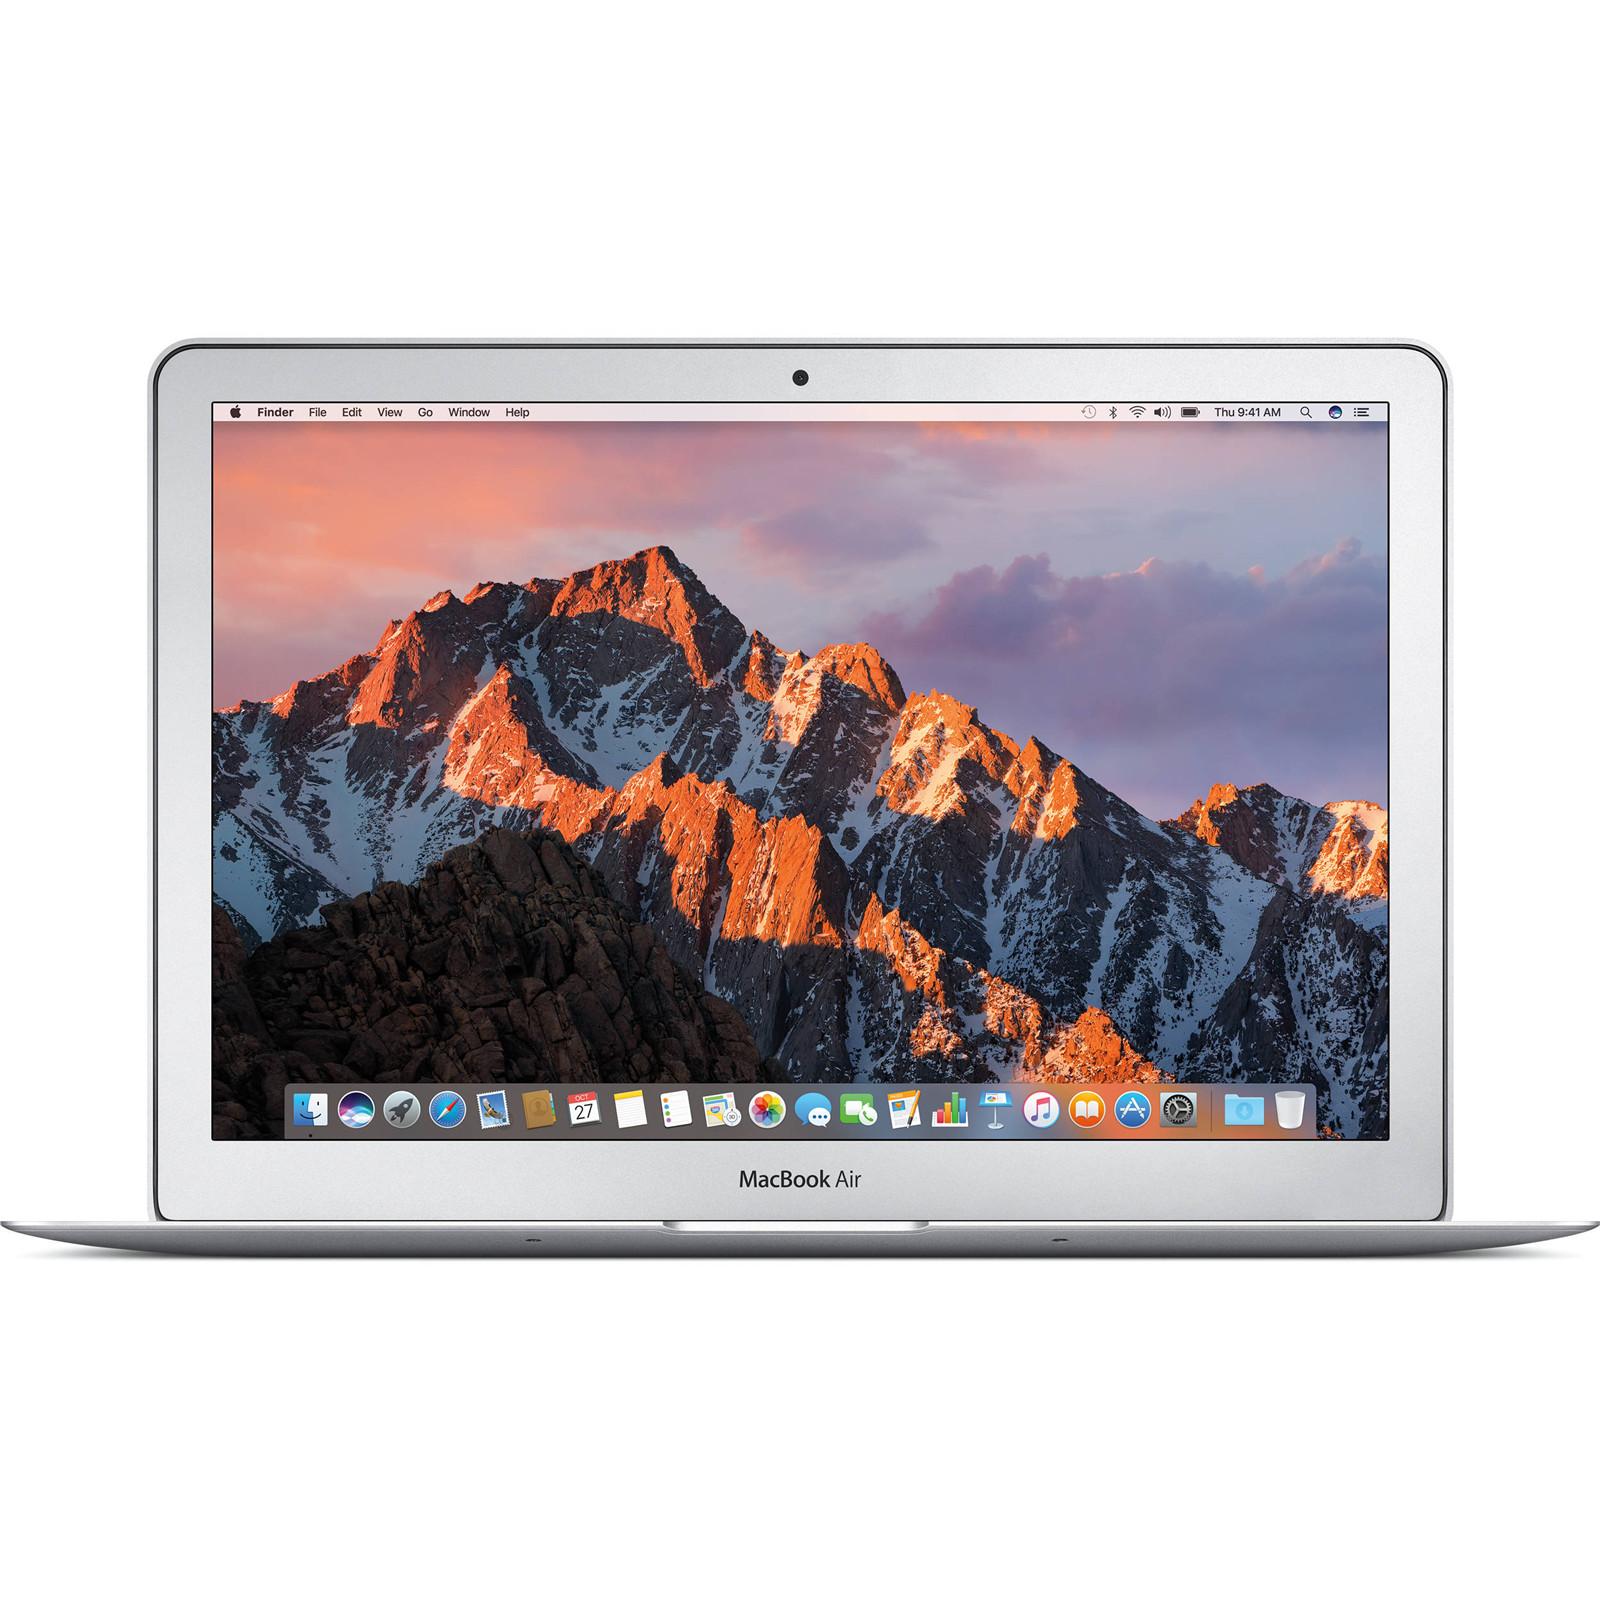 Buy The Apple 13 Macbook Air 18ghz Dual Core Intel I5 Hardcase Alumunium Oppo Find 5 Mini Gold Processor8gb Ram 256gb Ssd Storage